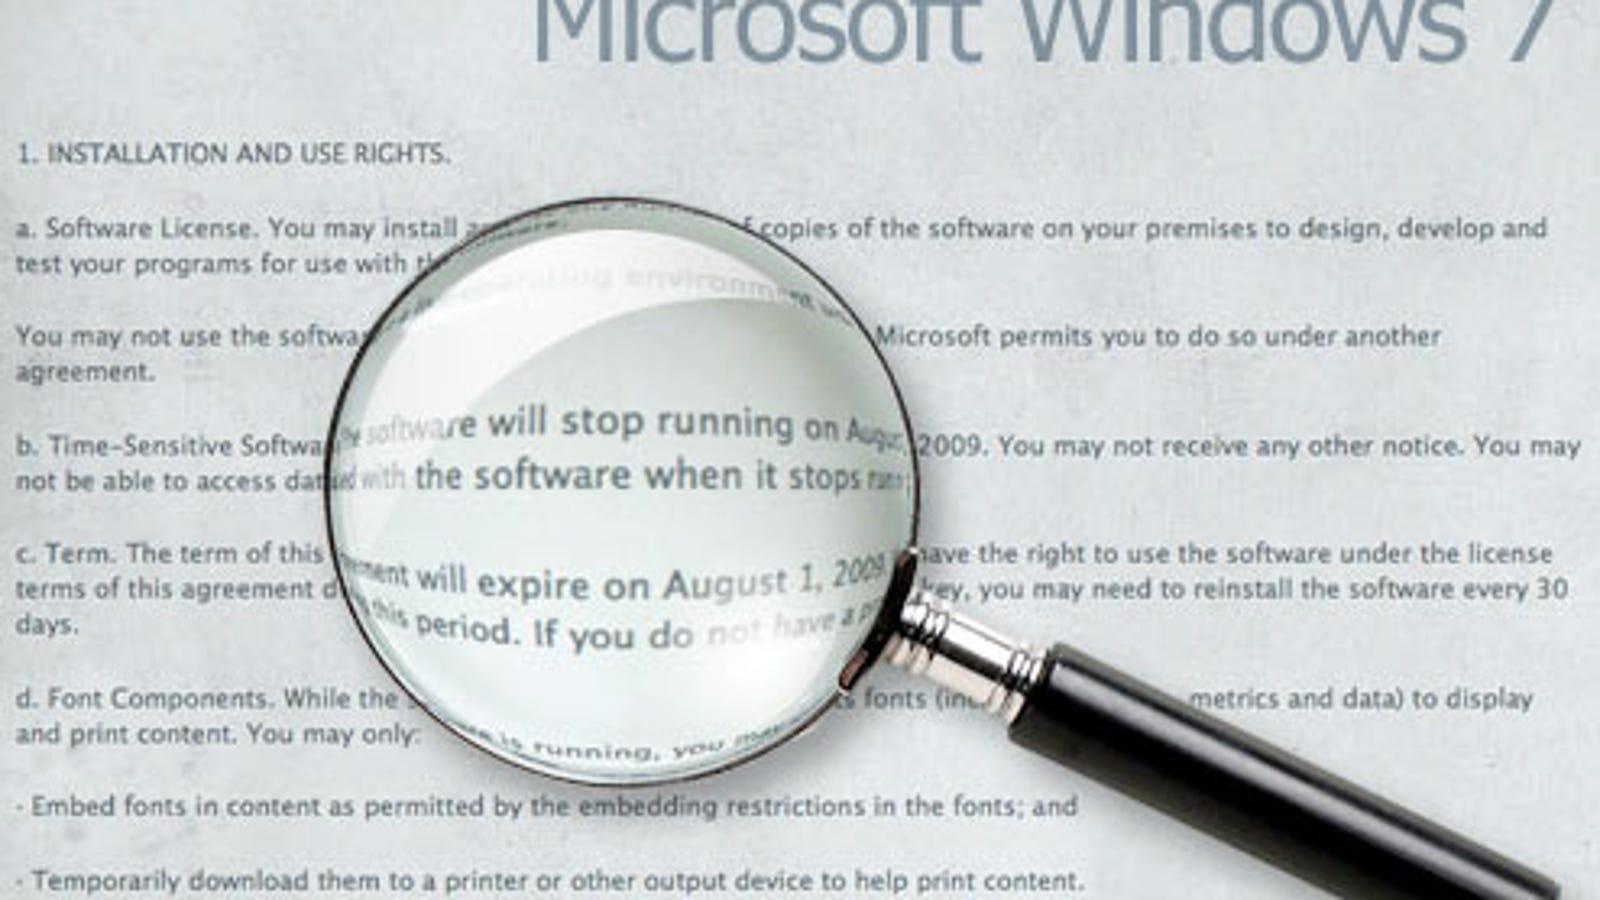 what happens when windows 7 license expires